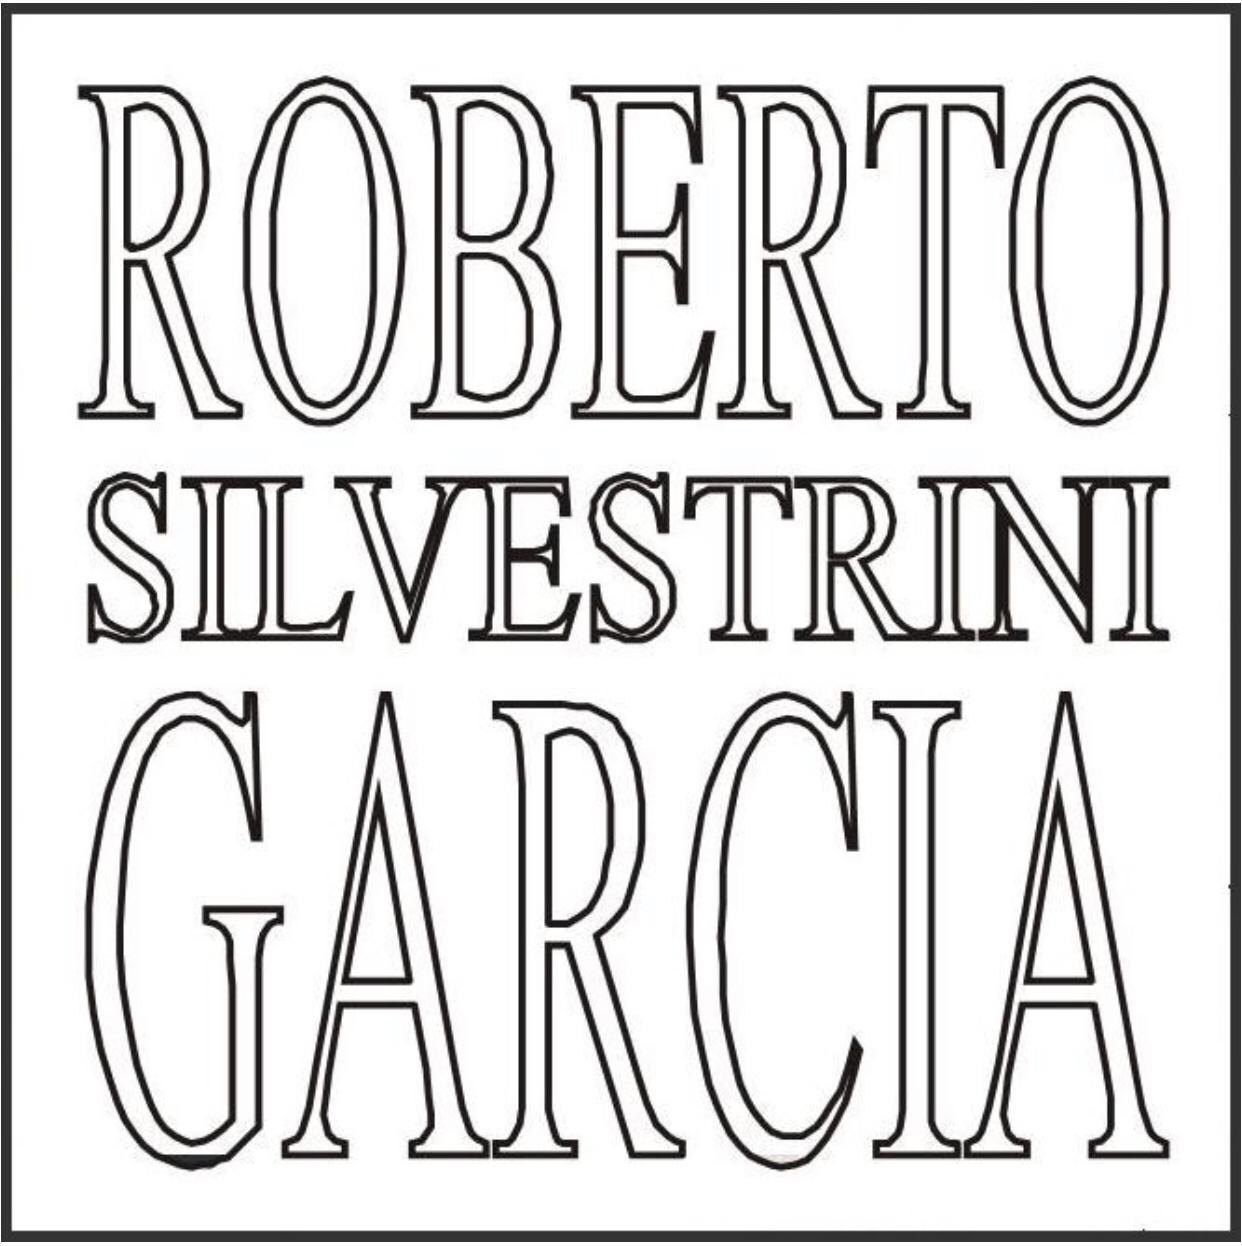 Roberto Silvestrini Garcia